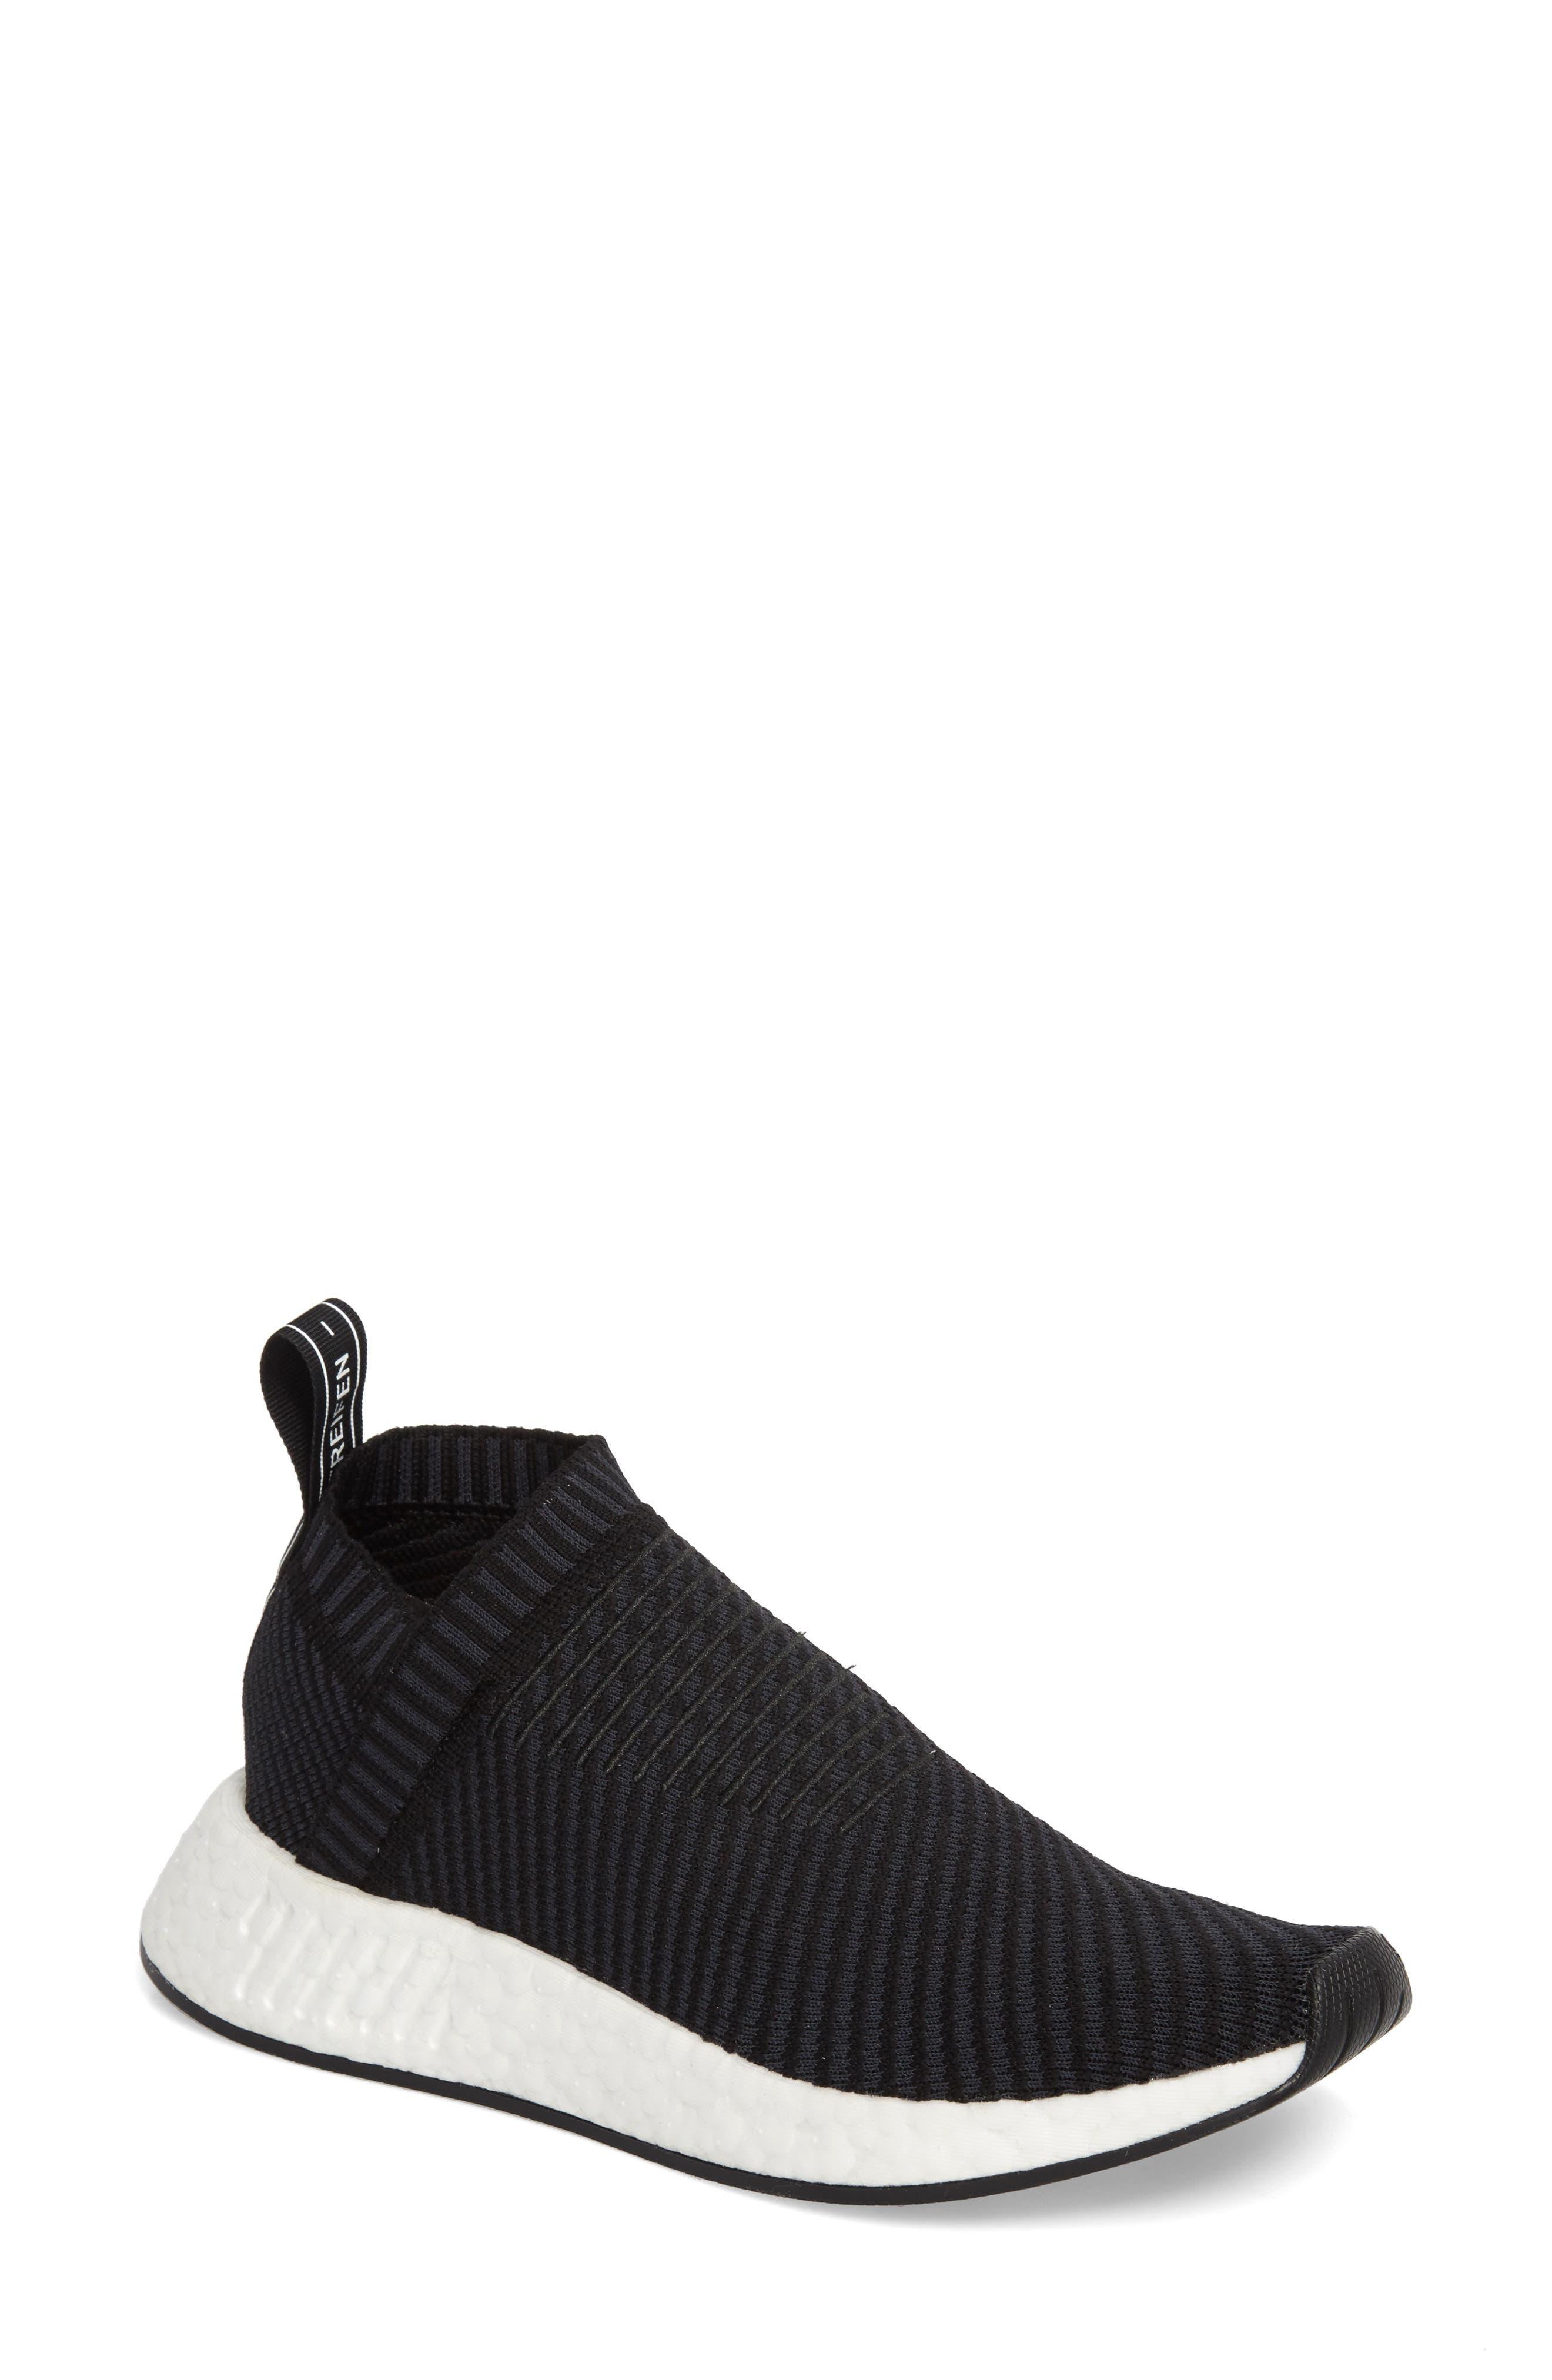 adidas NMD CS2 Primeknit Sneaker (Women)